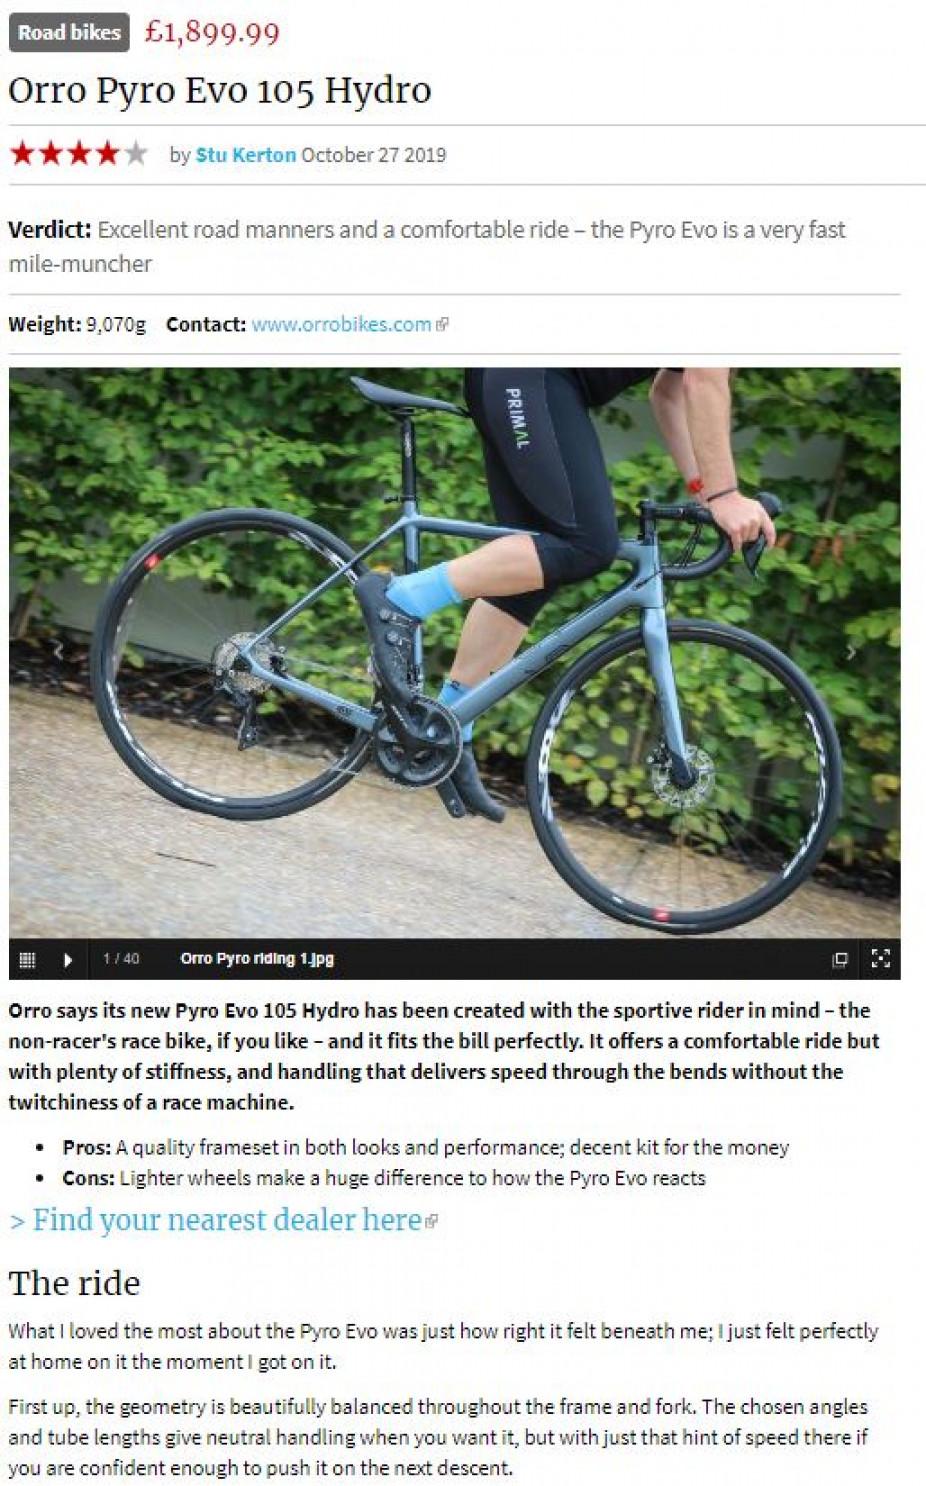 Pyro Evo 105 Hydro Road Cc Review Orro Bikes